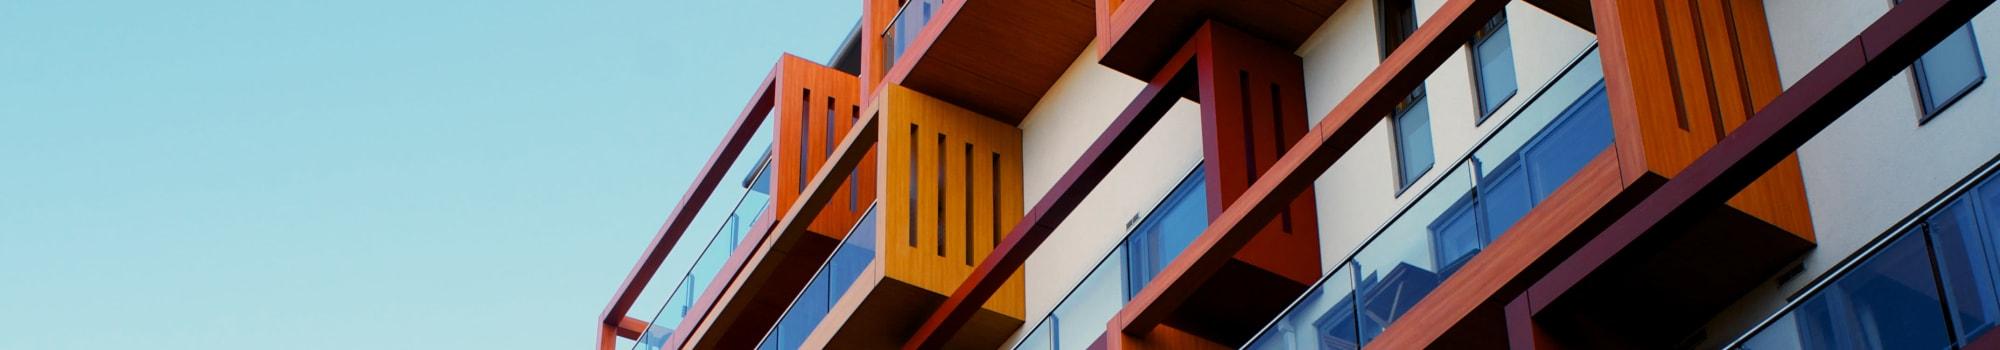 Maintenance Request of Decatur Victoria Estates in Berlin, Maryland